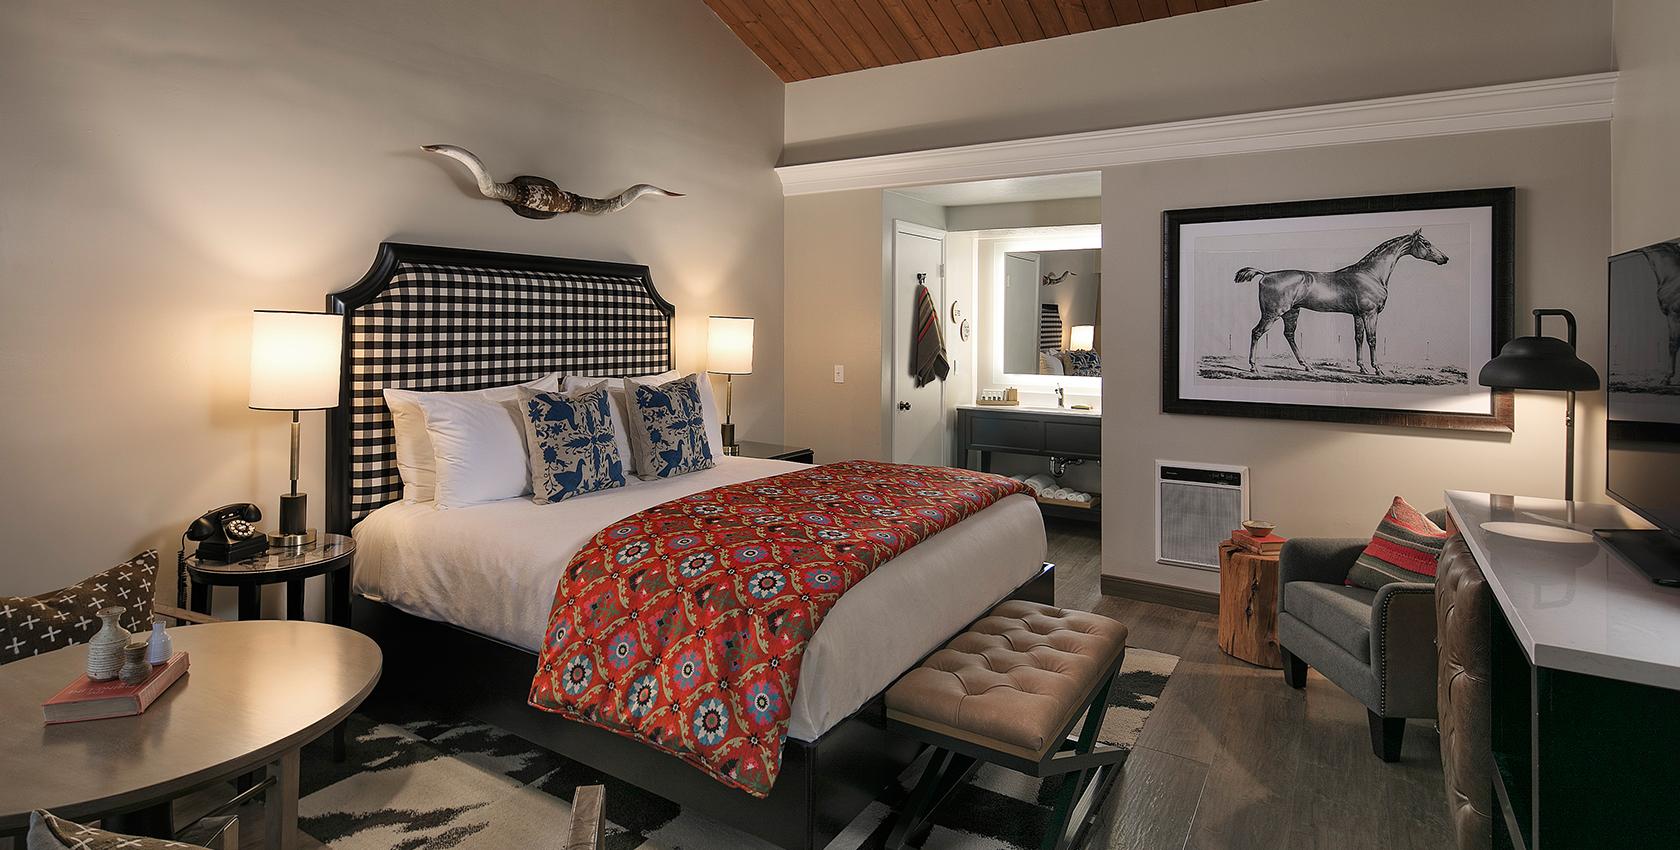 Ocean_point_ranch_cambria_hotel.jpg